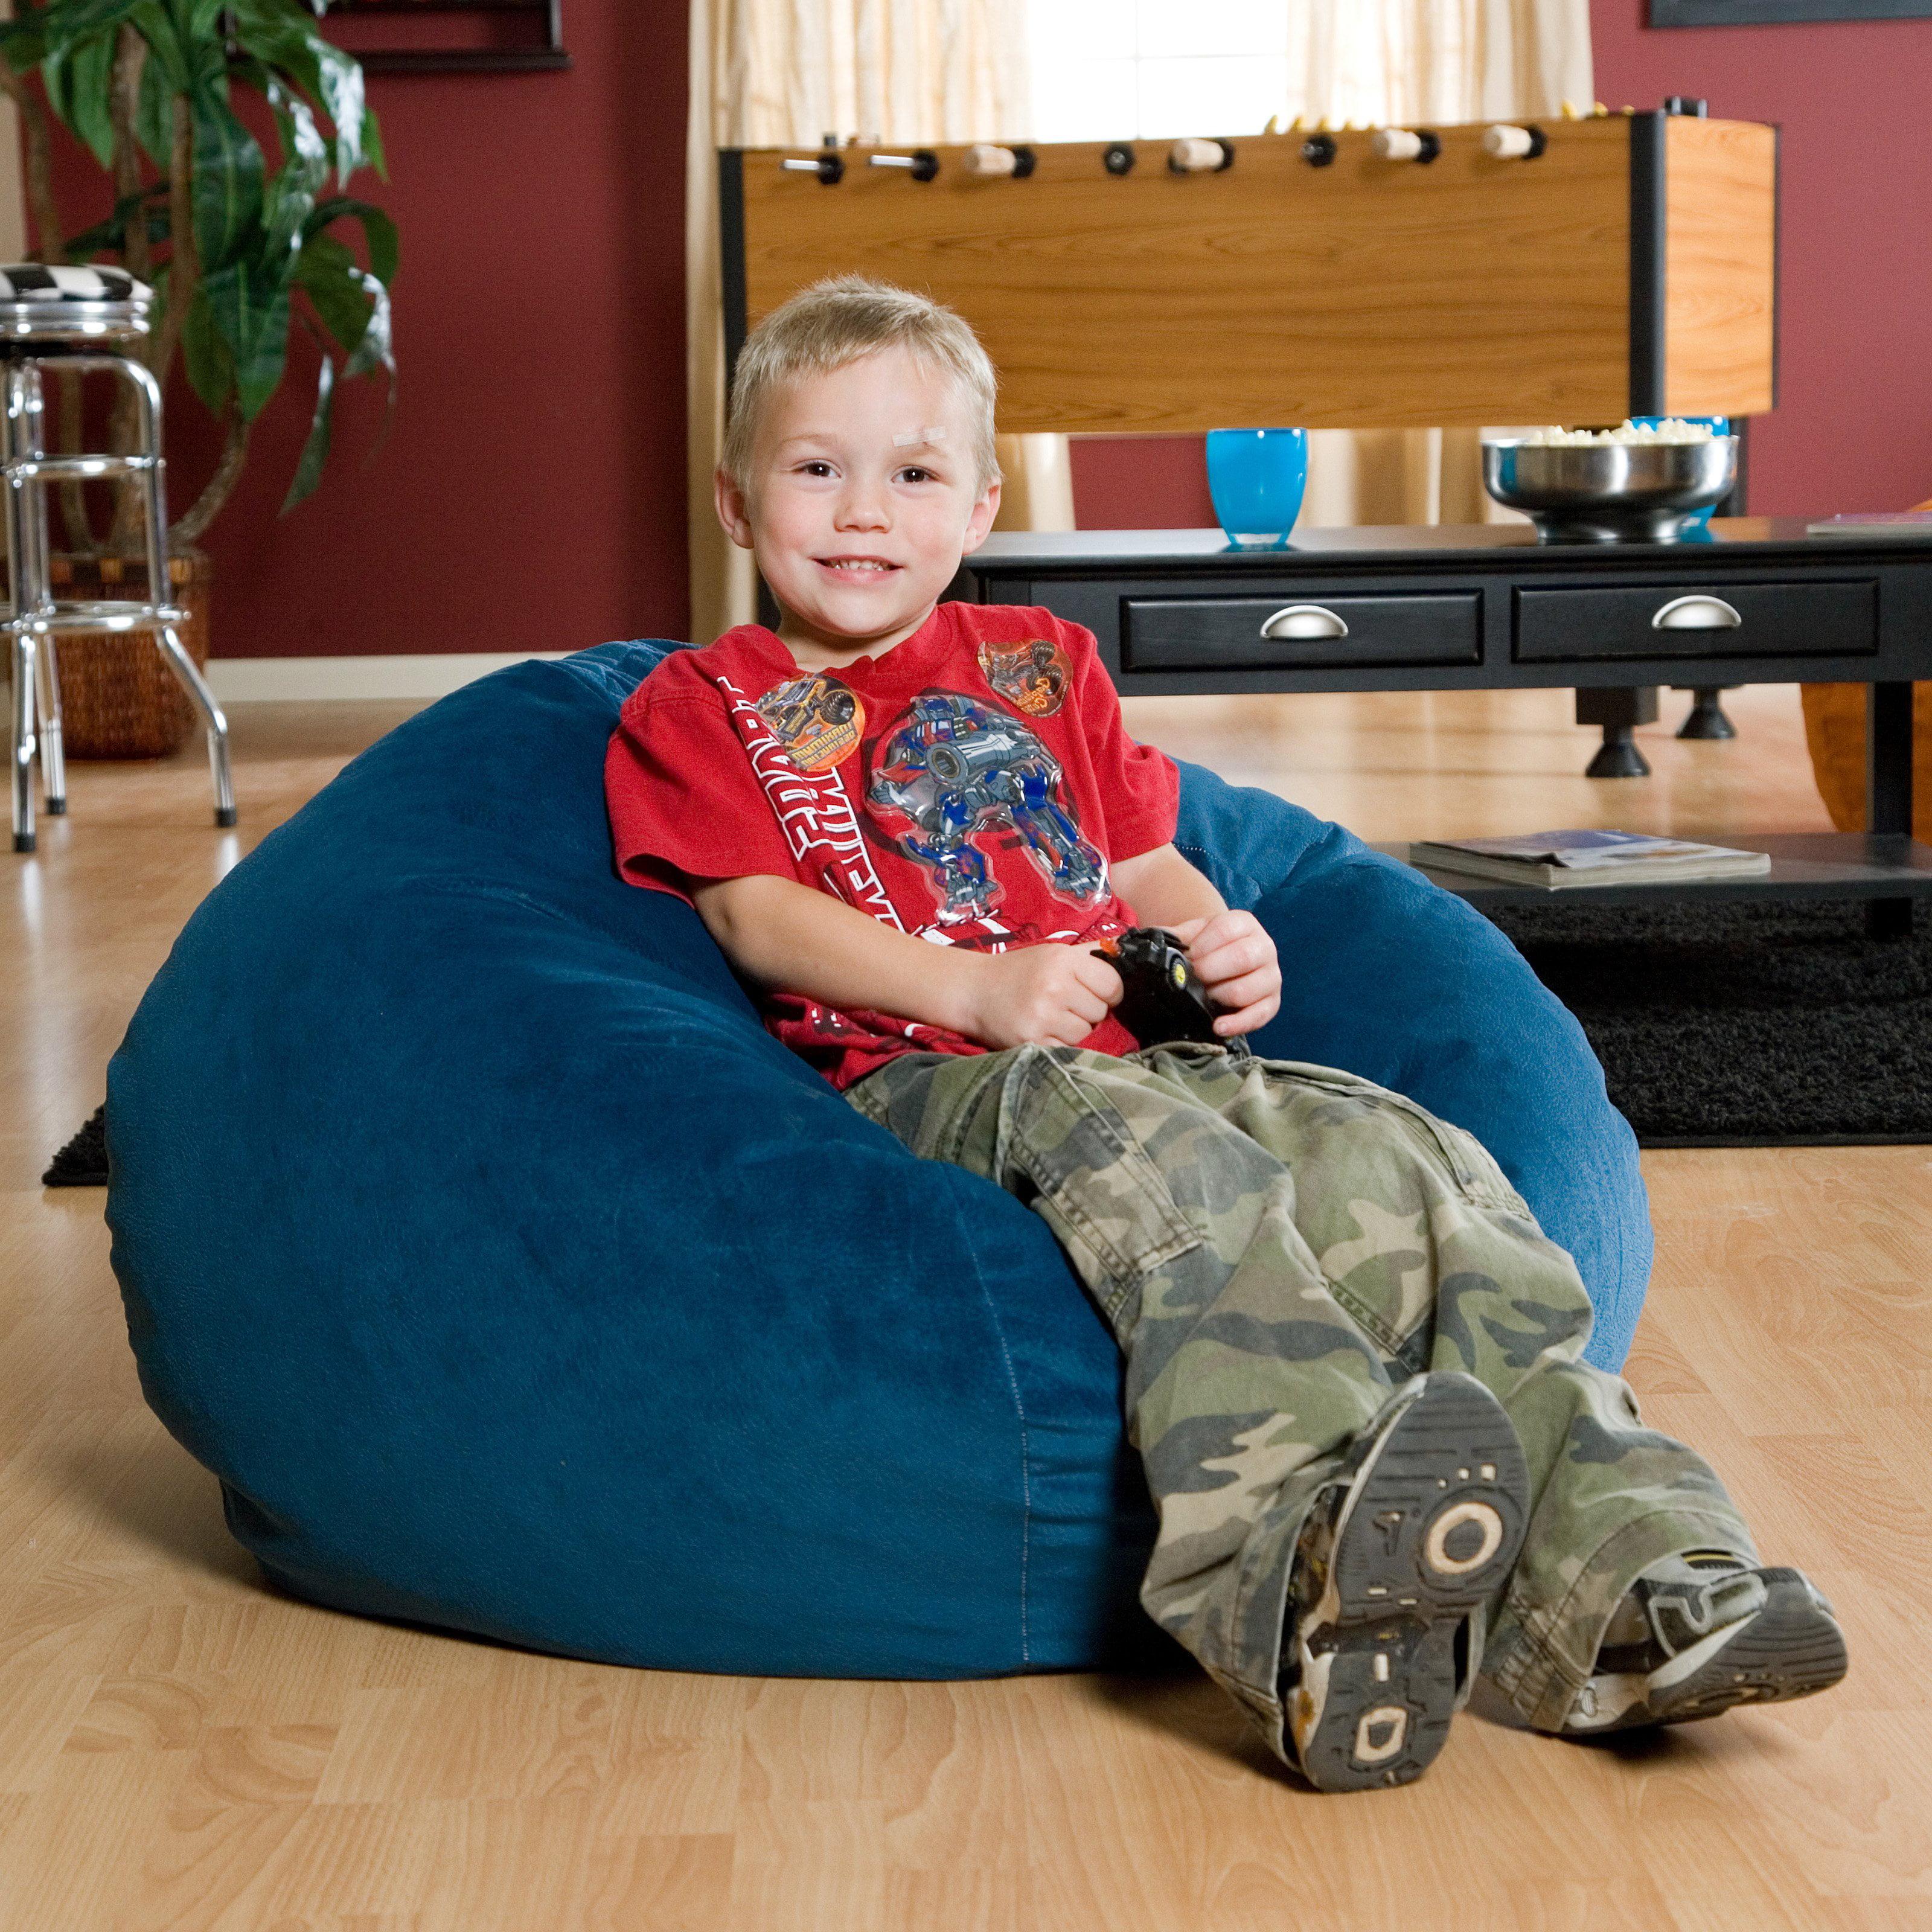 Strange Small 105 Black Microsuede Bean Bag Andrewgaddart Wooden Chair Designs For Living Room Andrewgaddartcom